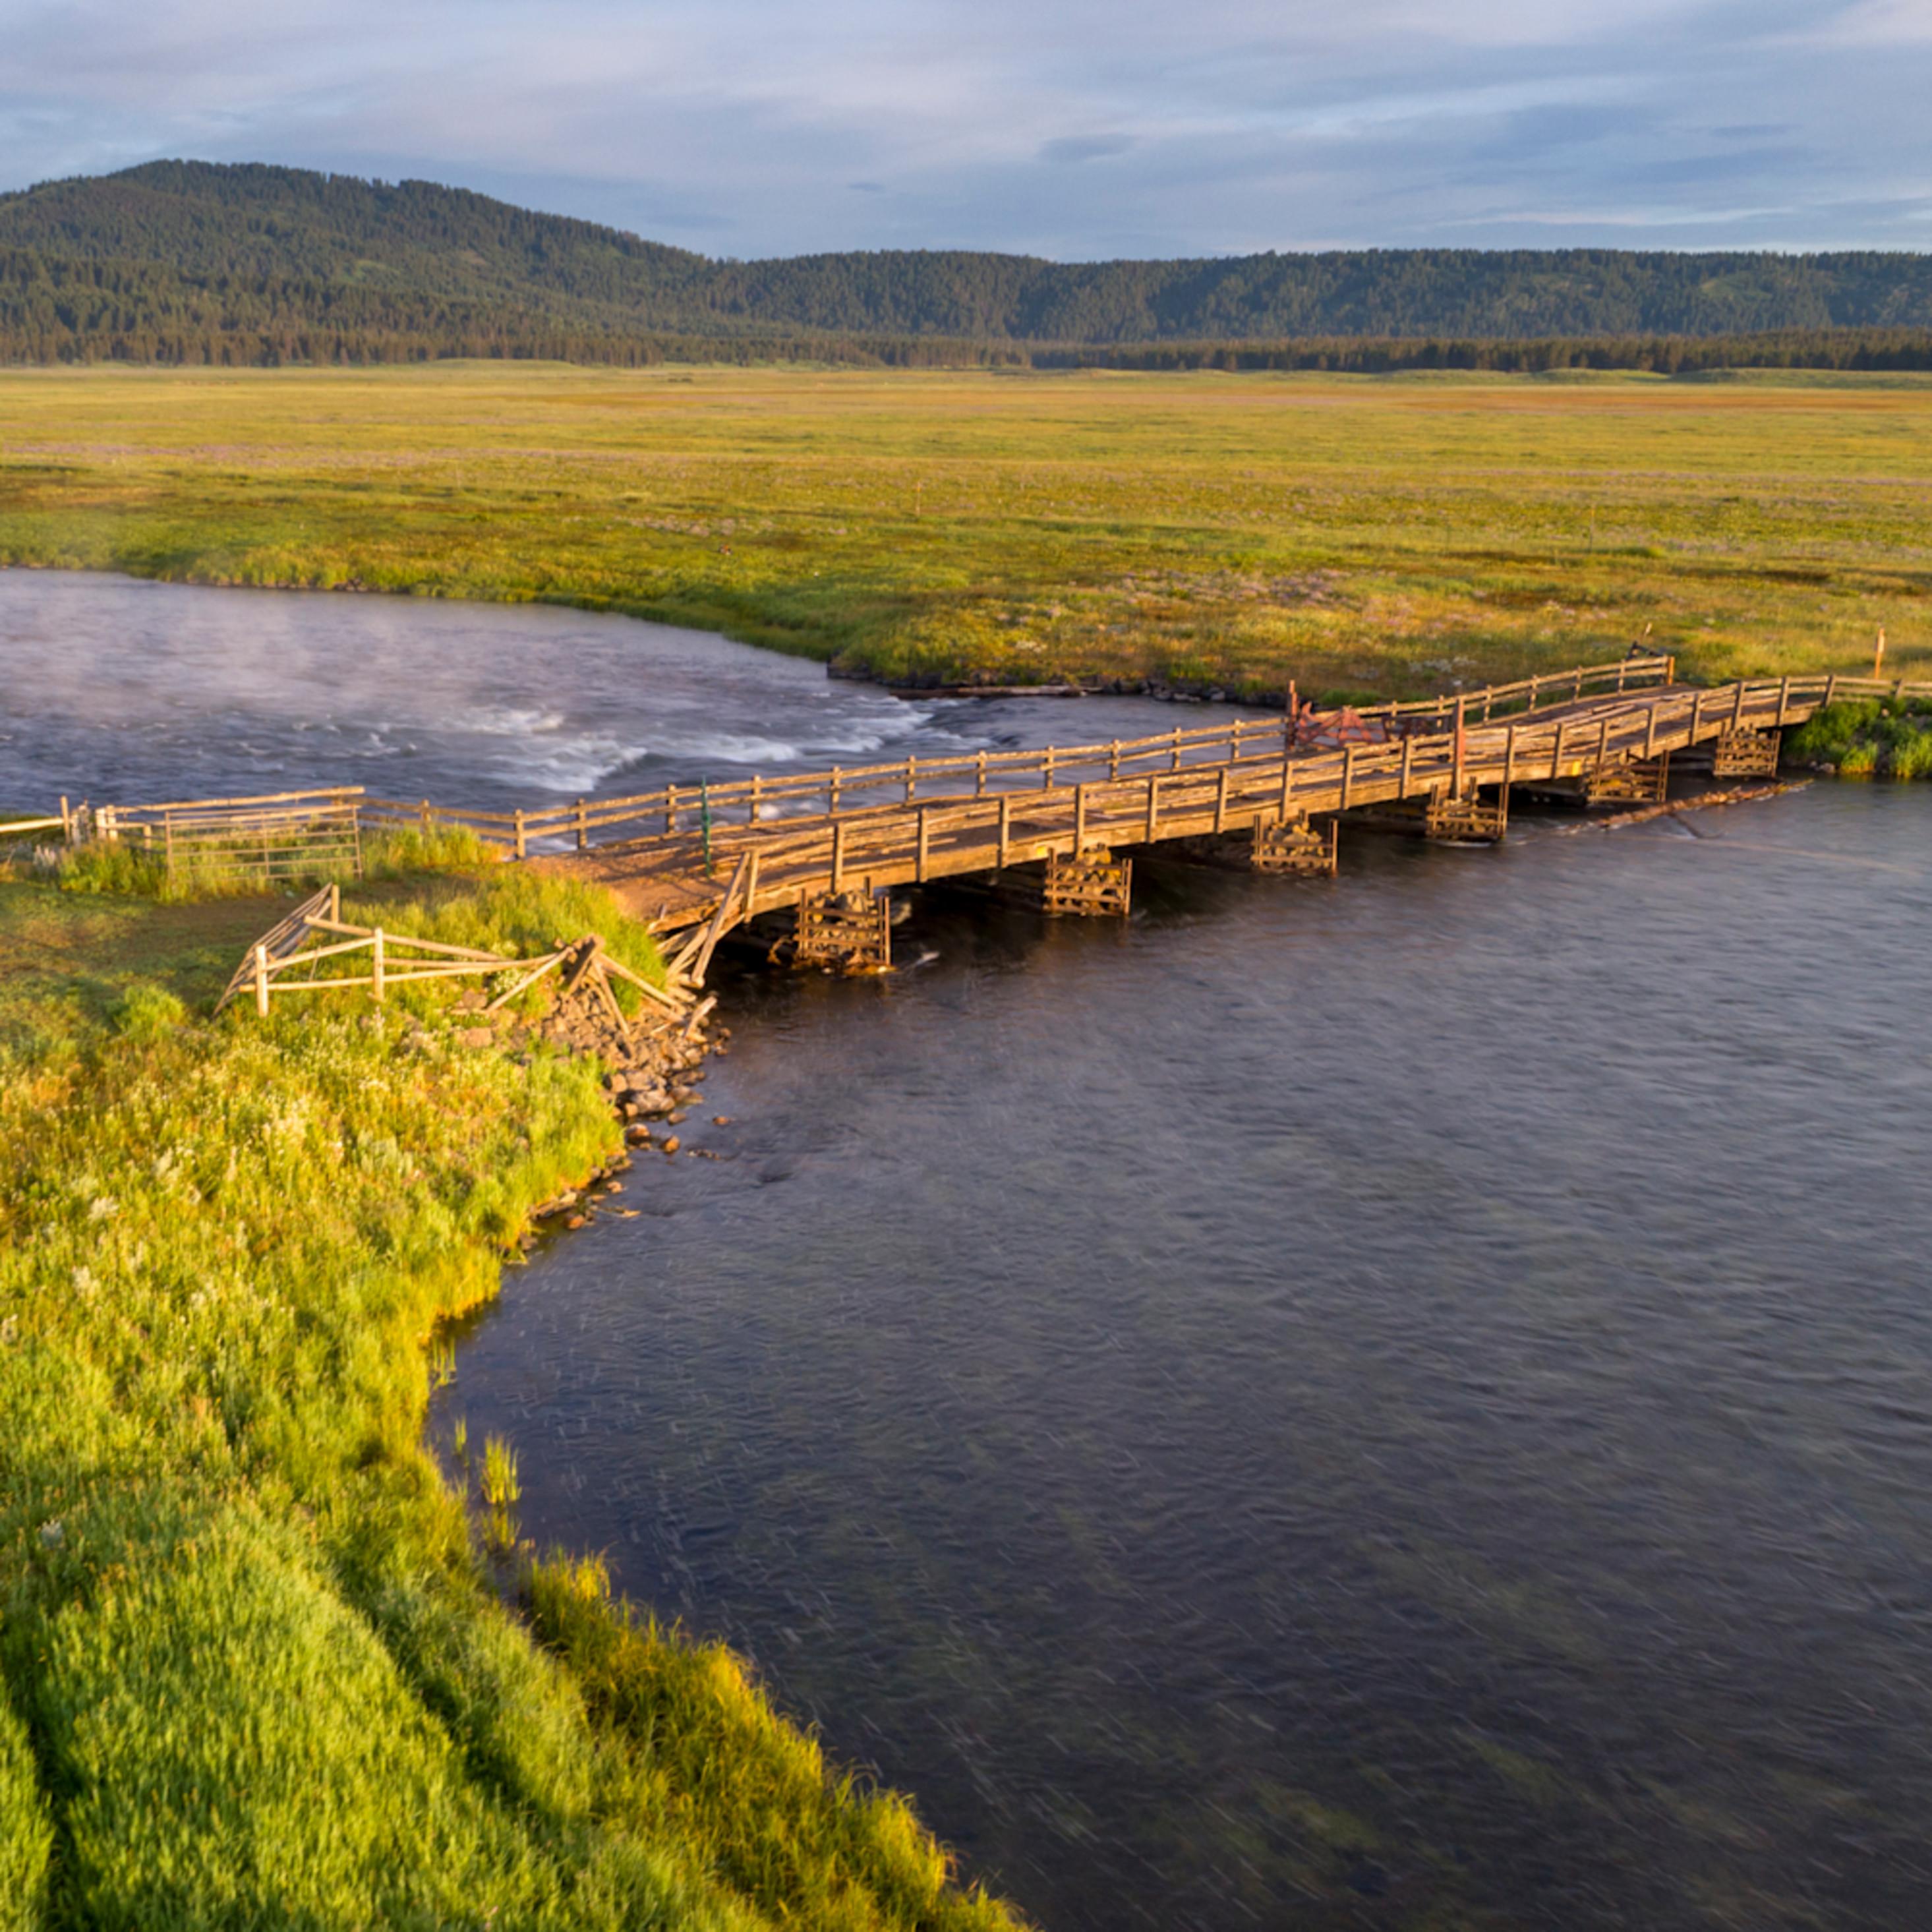 2092 bridge across henrys fork 1.6 4689 x 2931 j100argb 20190827 1449 yfo4jy